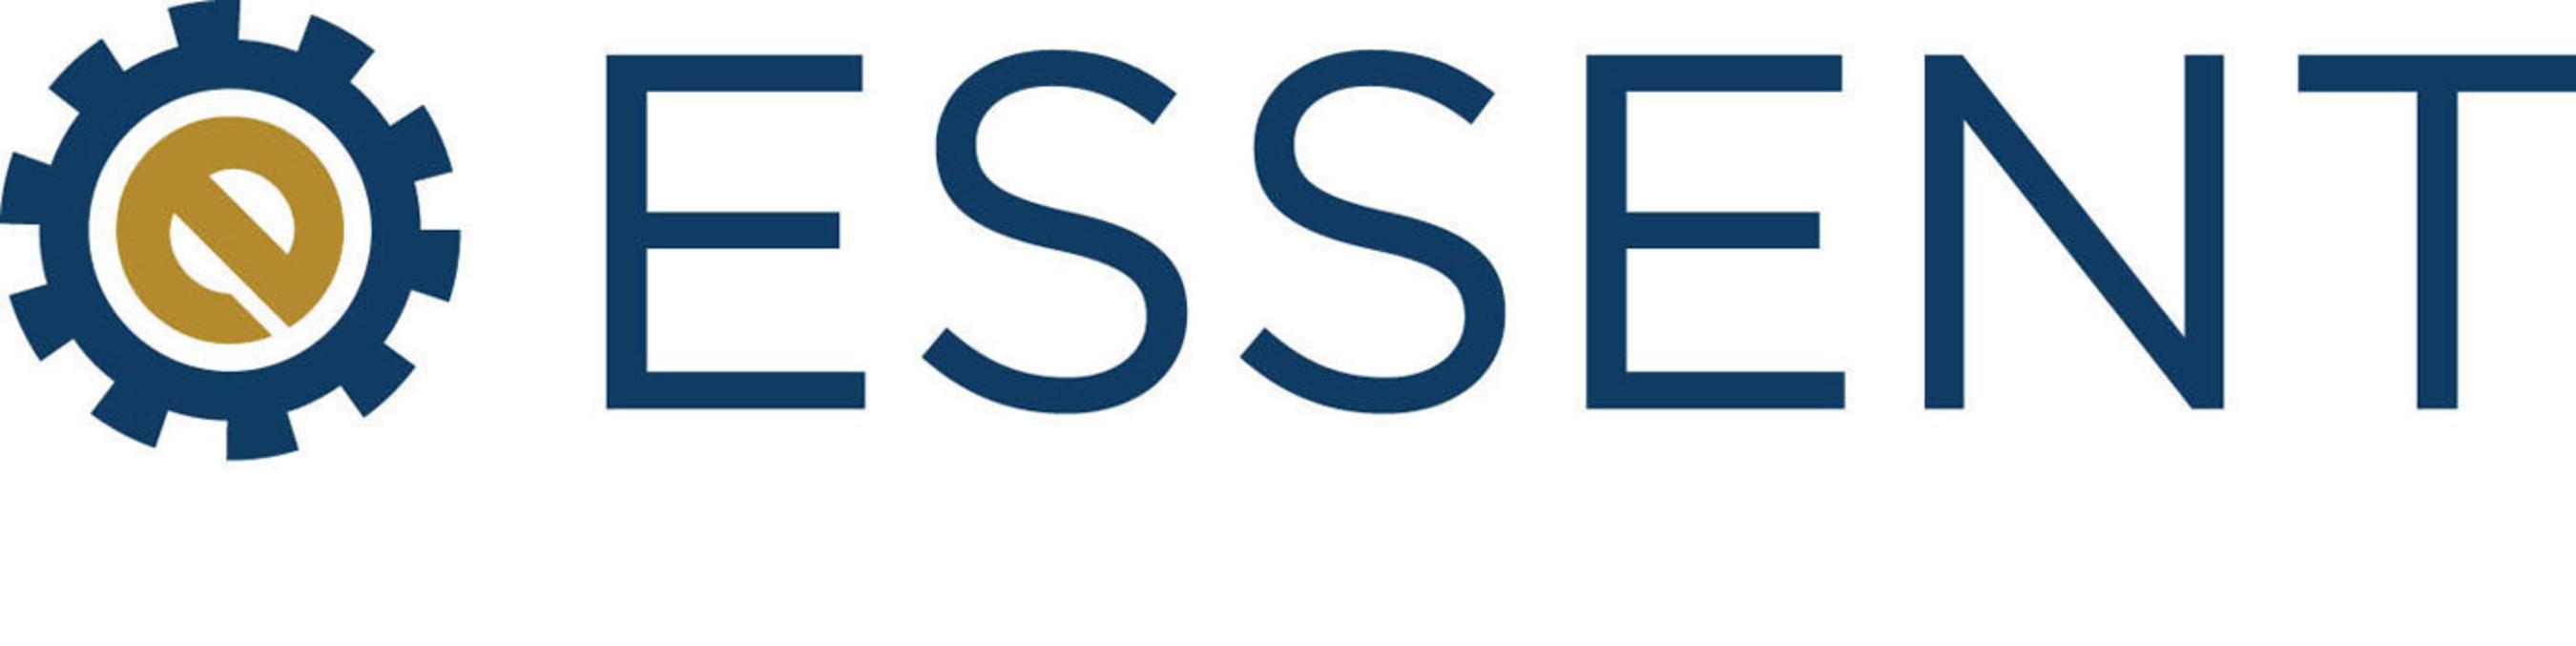 Essent Logo. (PRNewsFoto/Essent Group Ltd.) (PRNewsFoto/ESSENT GROUP LTD.)